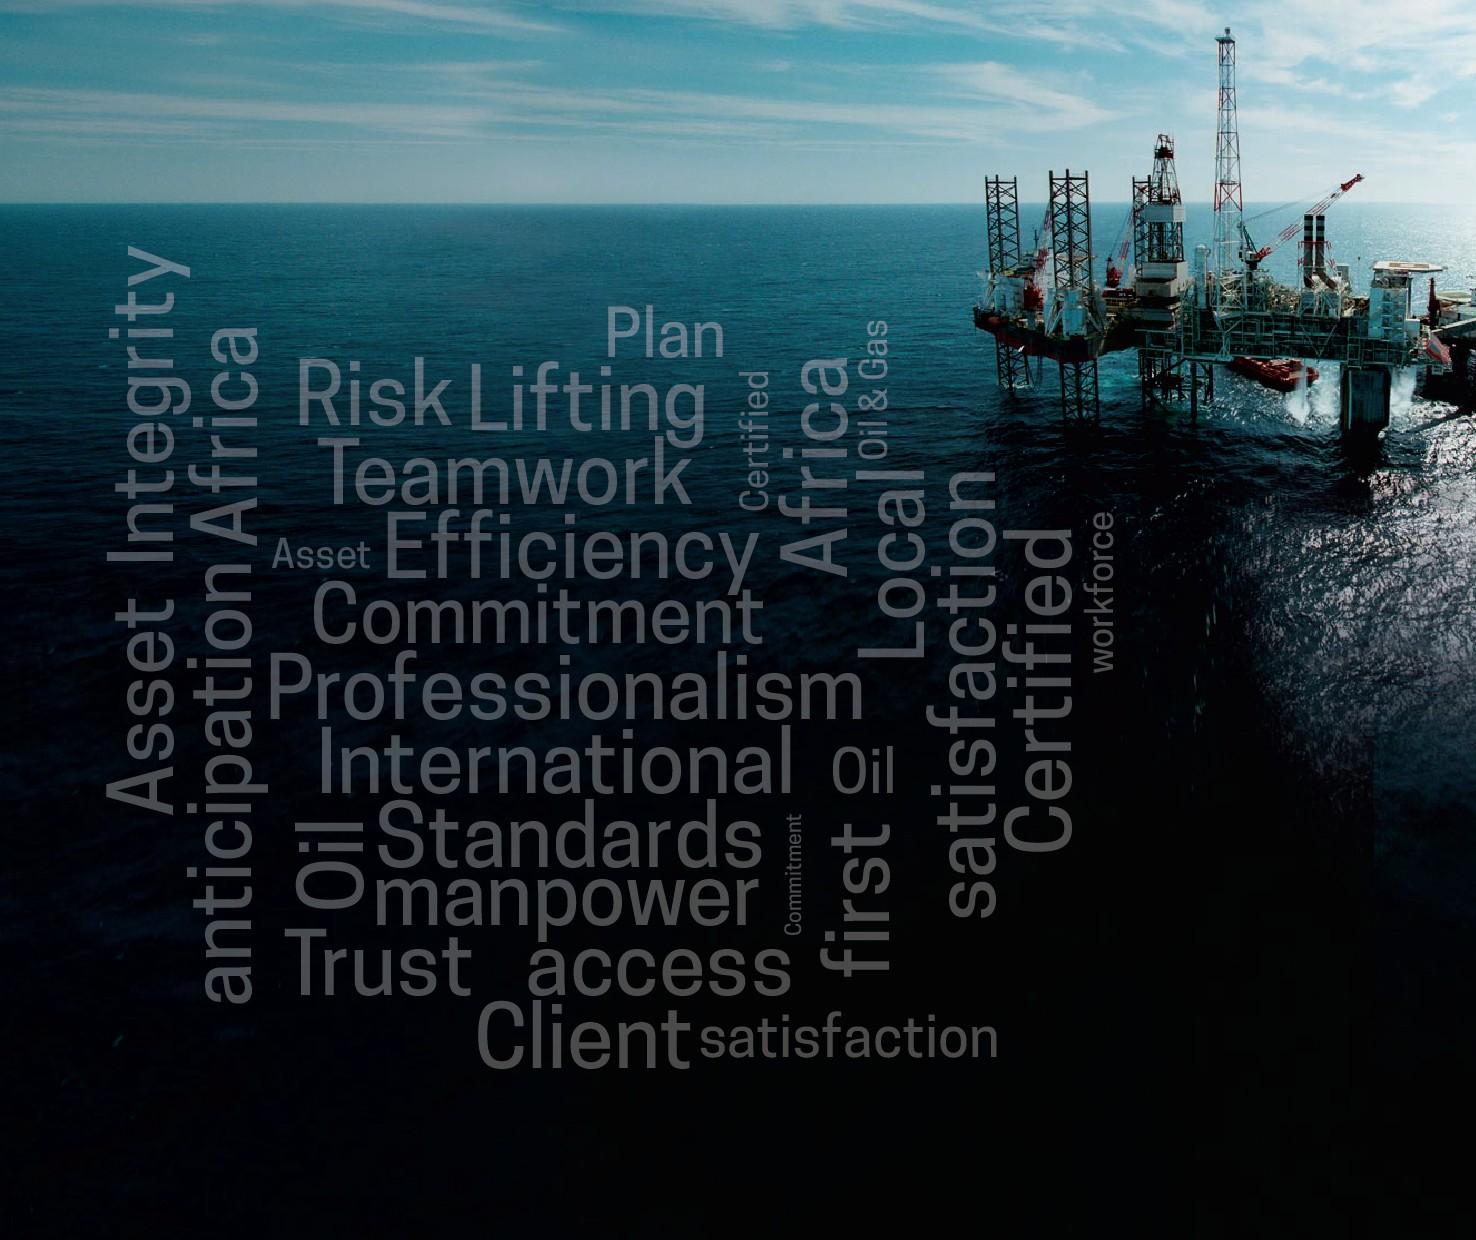 Prometric Offshore Services | LinkedIn